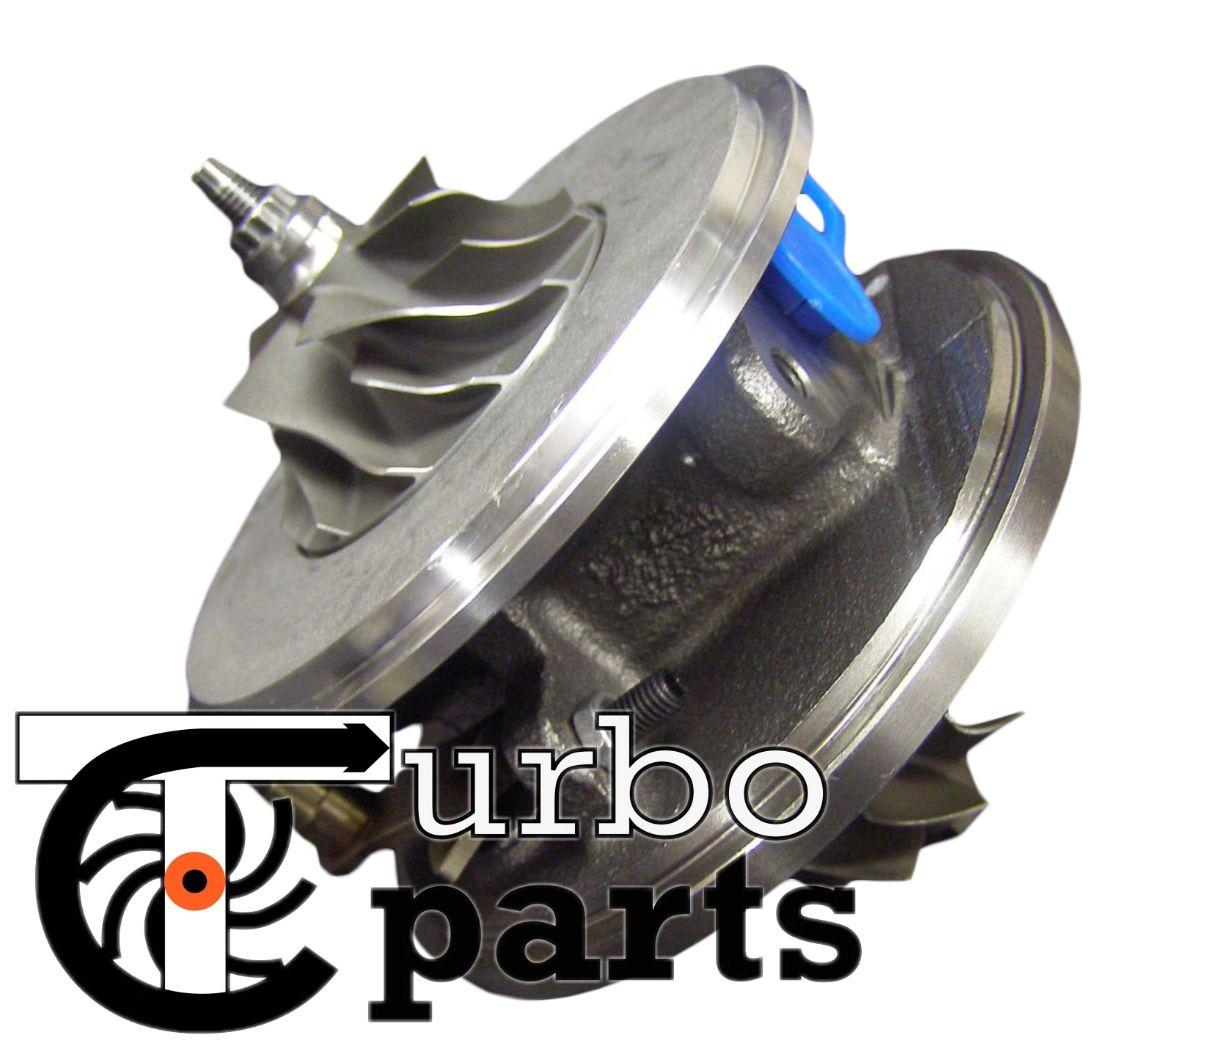 Картридж турбины BMW 2.0D 320d/ X3 от 2001 г.в. - 750431-0004, 750431-0007, 750431-0010